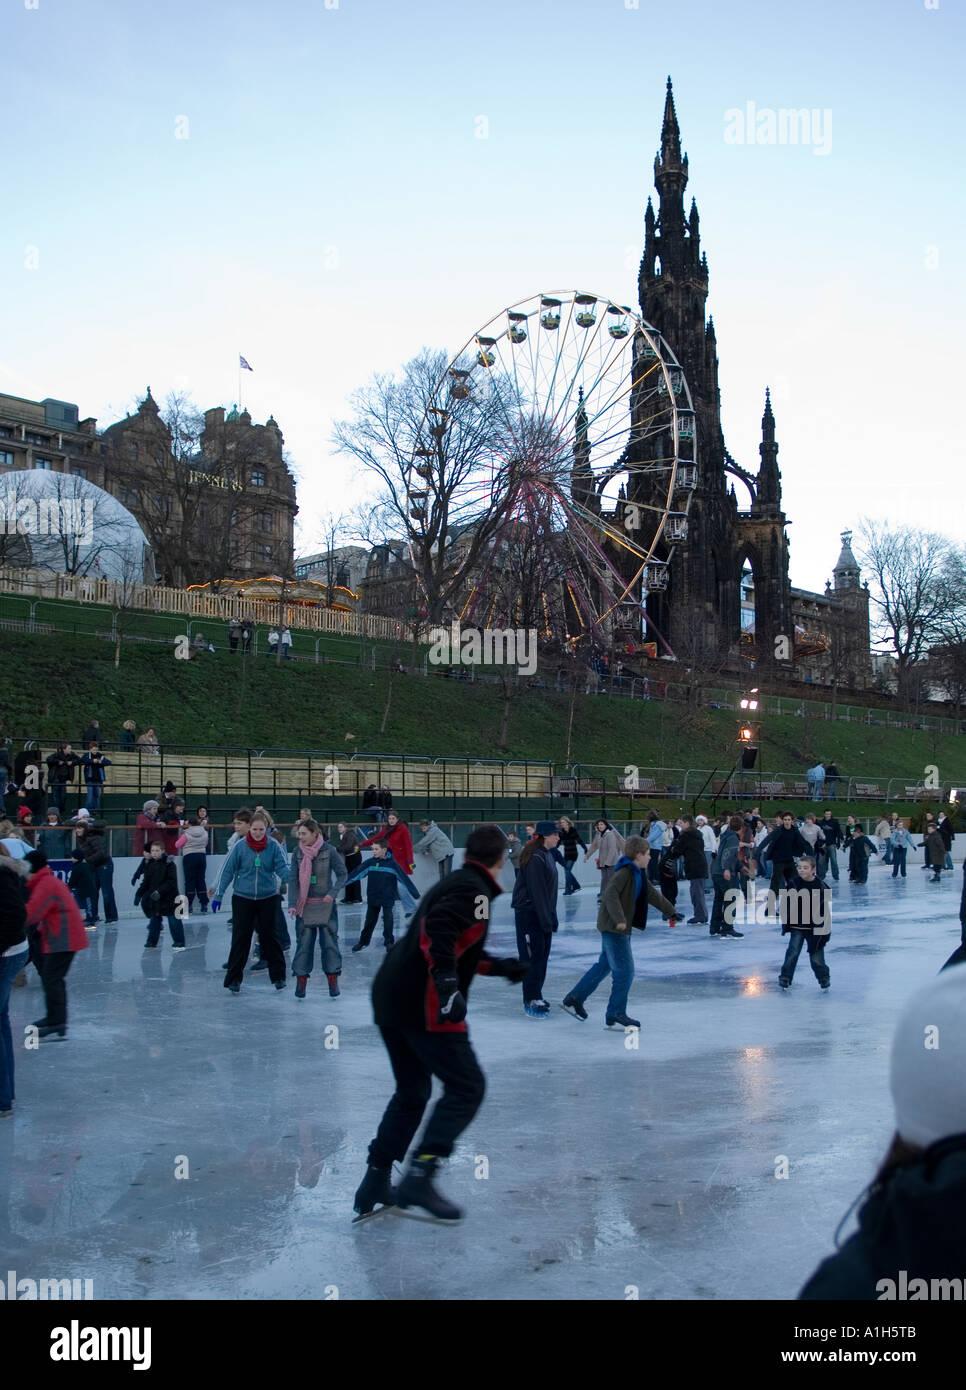 Outdoors ice rink in city centre, Edinburgh, Scotland Stock Photo